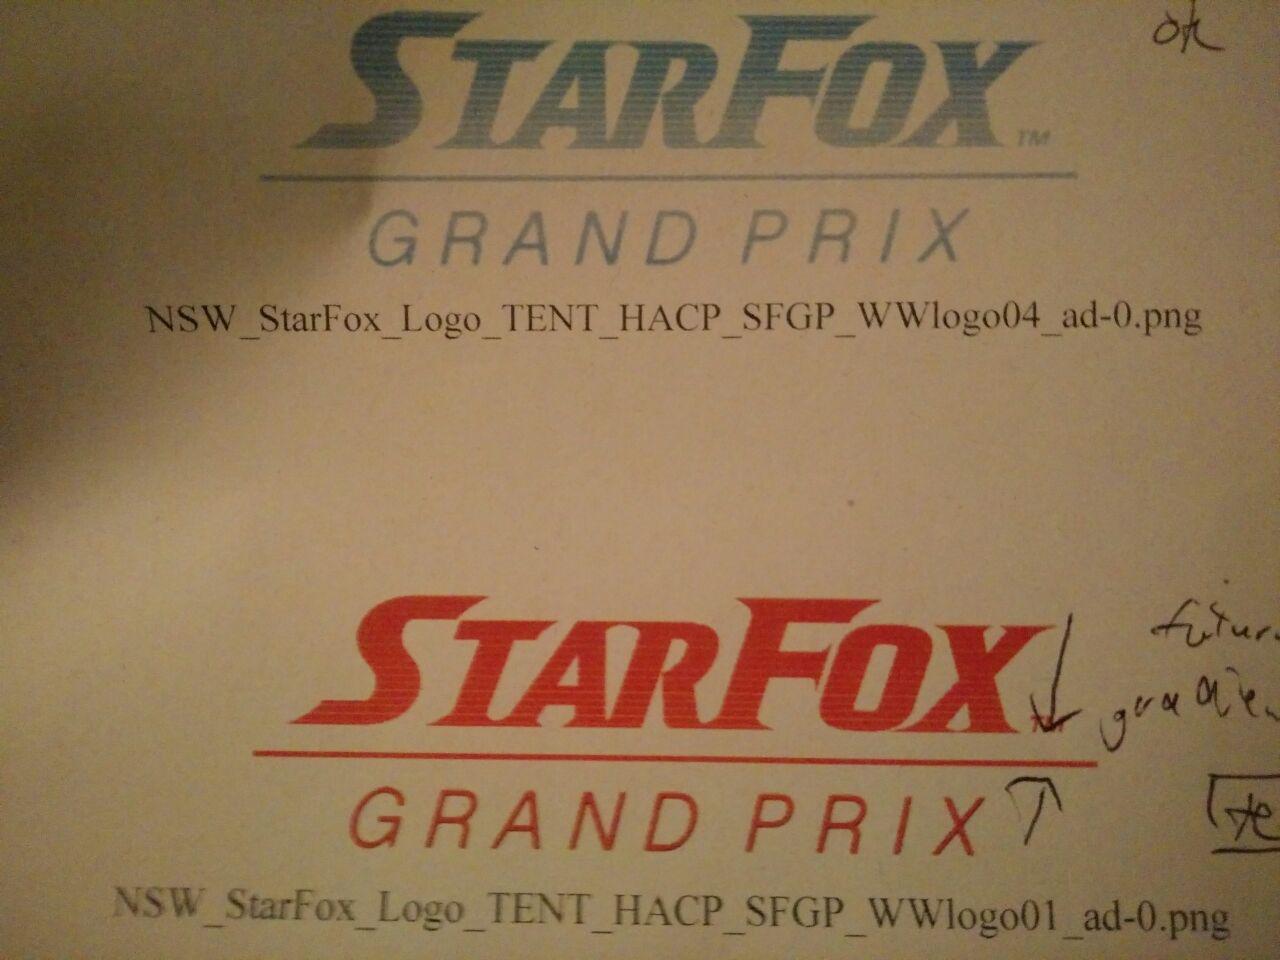 [Rumeurs] Star Fox Grand Prix par Retro Studios ? 1526309104-star-fox-grand-prix-leak-1